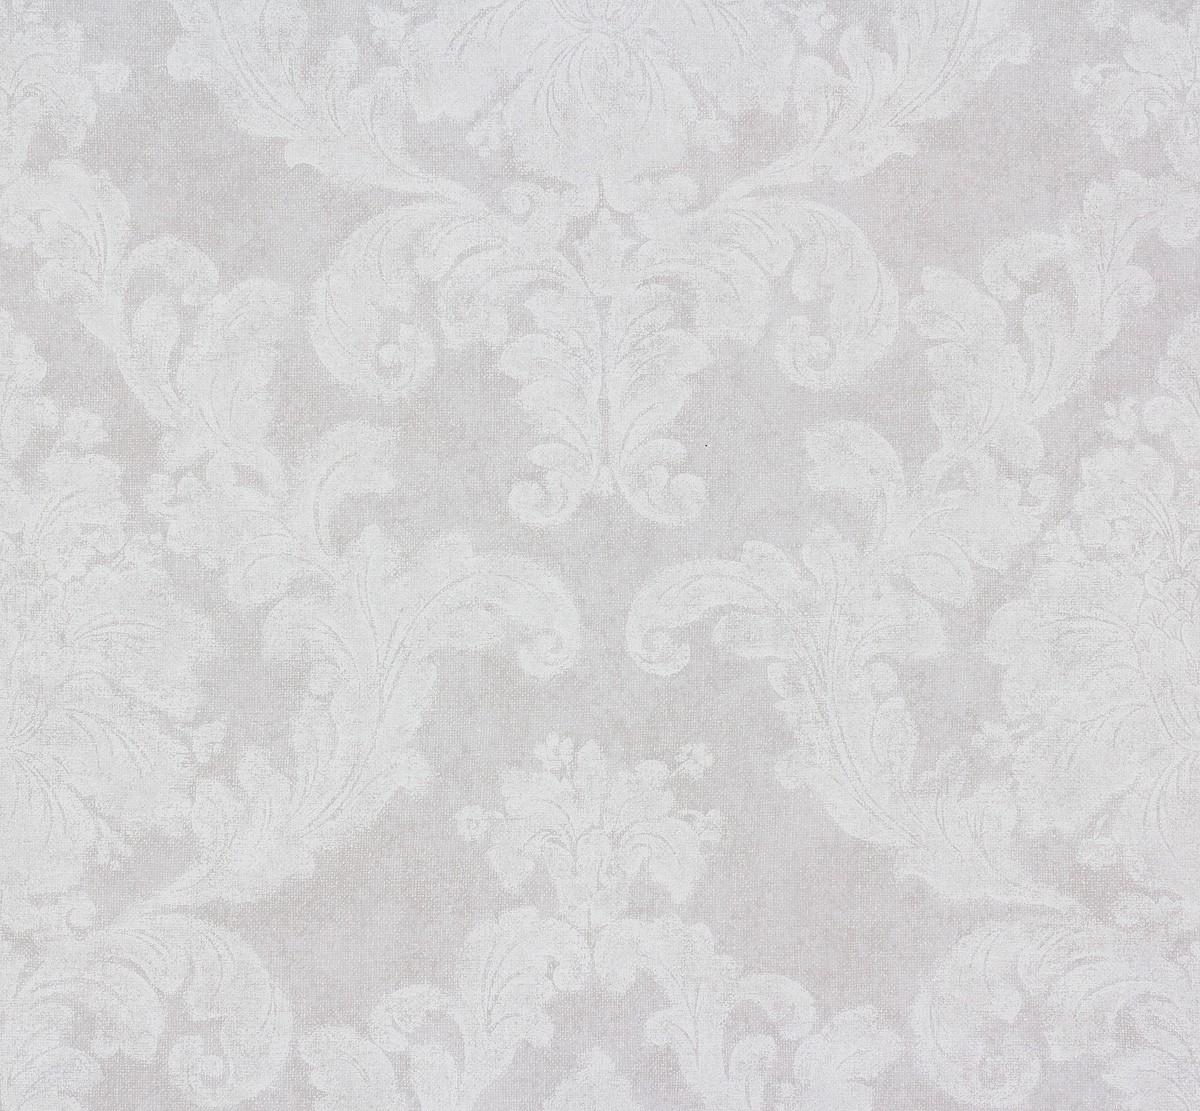 Tapete Elegance AS Creation Ornamente weiss grau 3 - Tapete Weis Ornamente